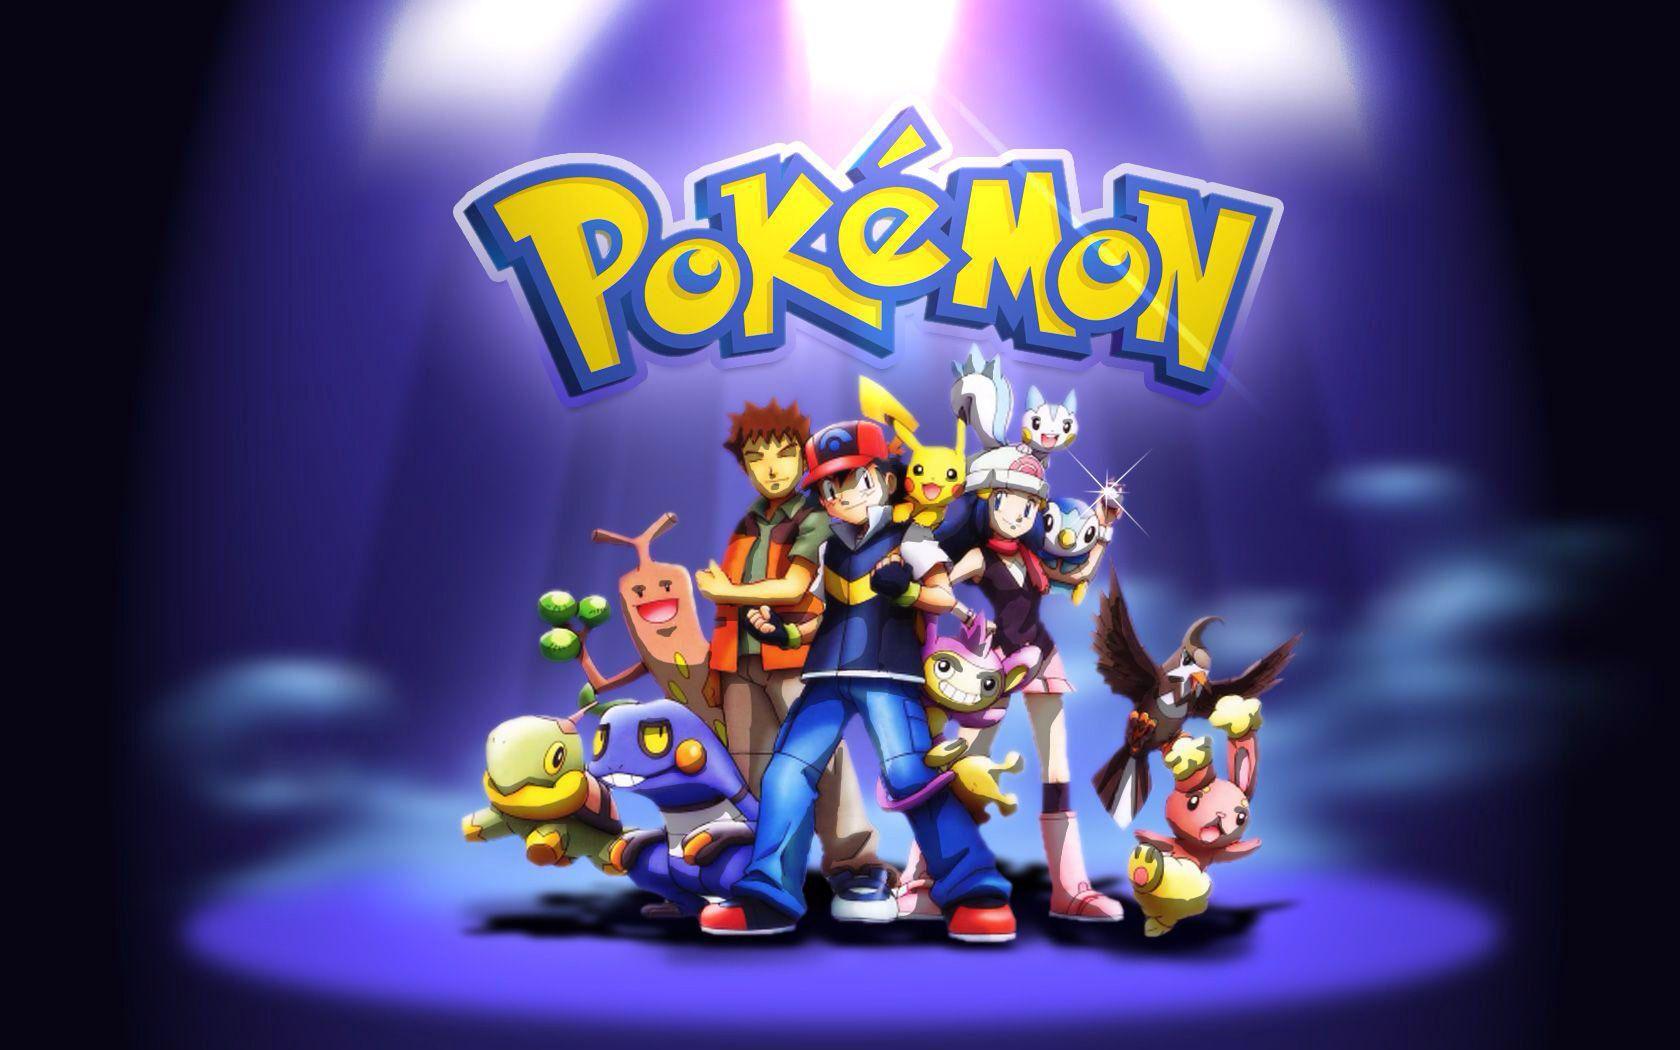 Share An Pokemon Wallpaper Download ACG Wallpapers